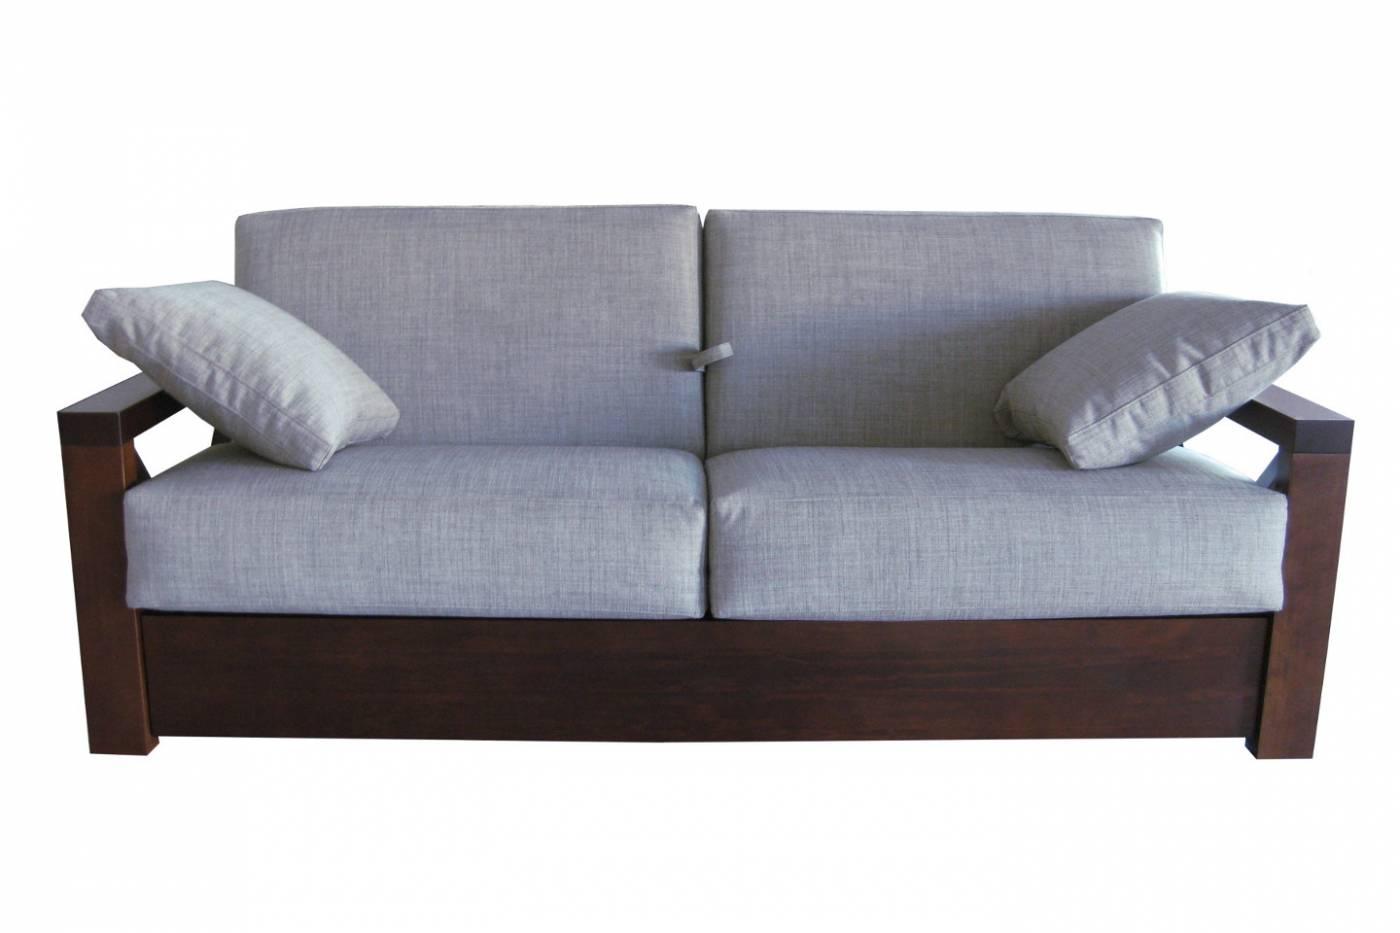 Divano Letto Rustico : Divano letto rustico lisbona abiesse divani